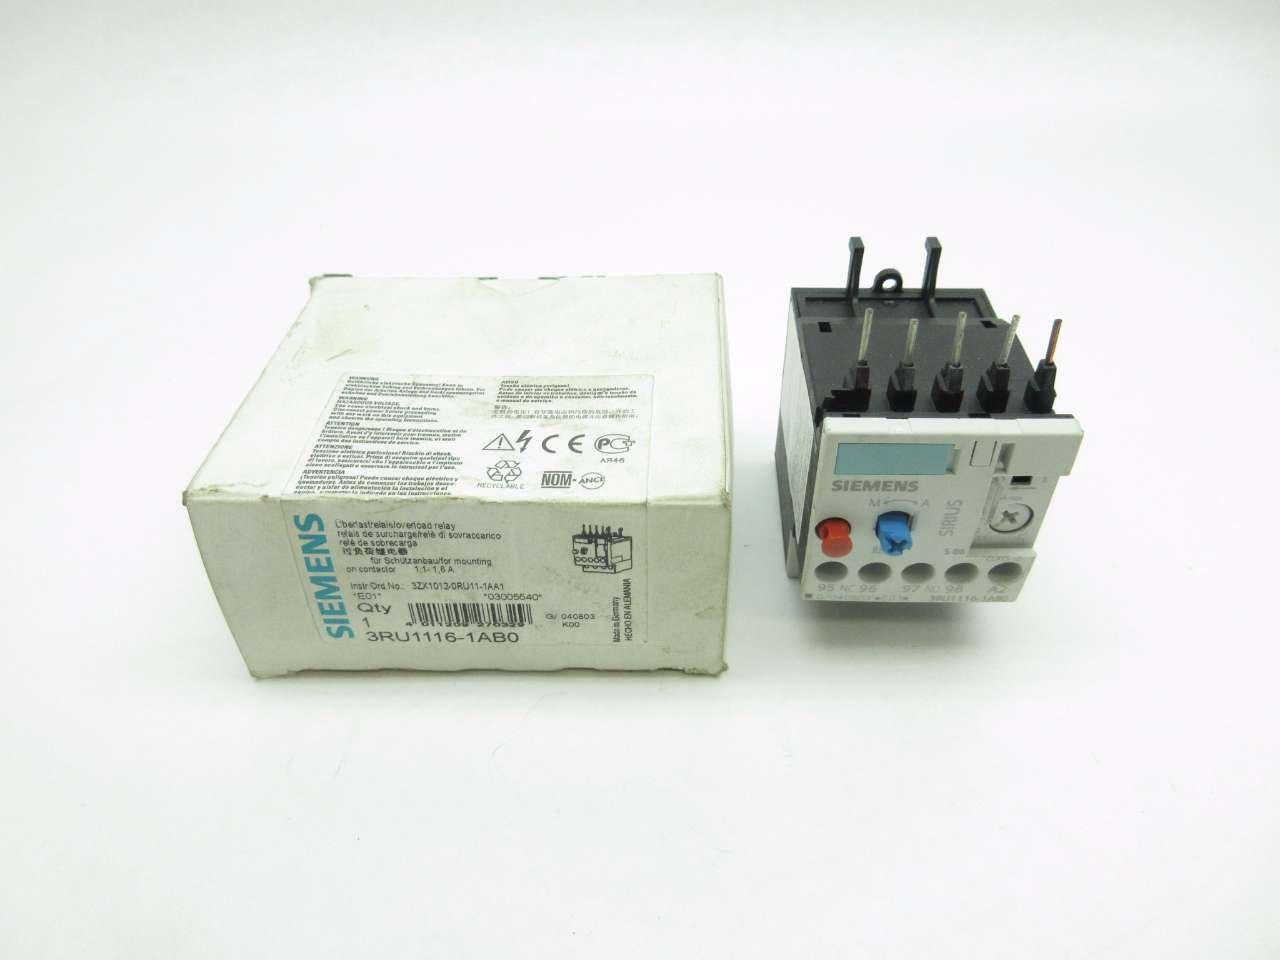 NEW SIEMENS 3RU1116-1AB0 SIRIUS 1.1-1.6A AMP 600V-AC OVERLOAD RELAY D542855